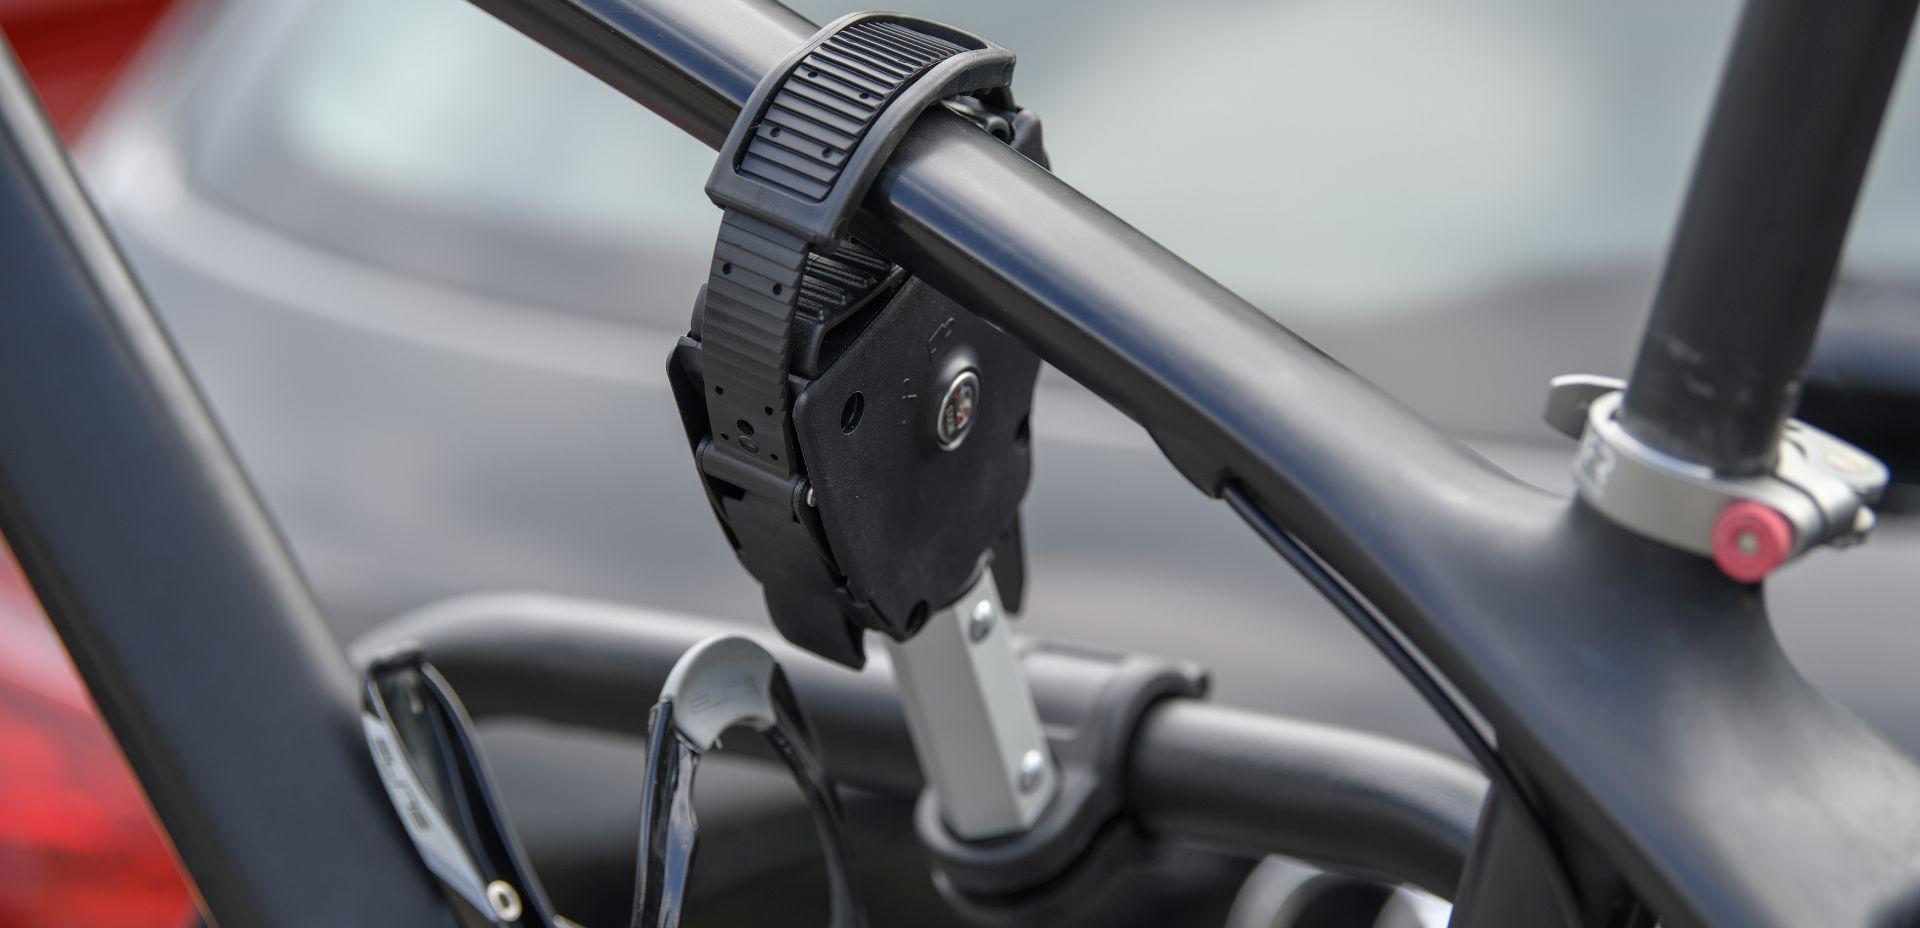 Bike Racks Accessories